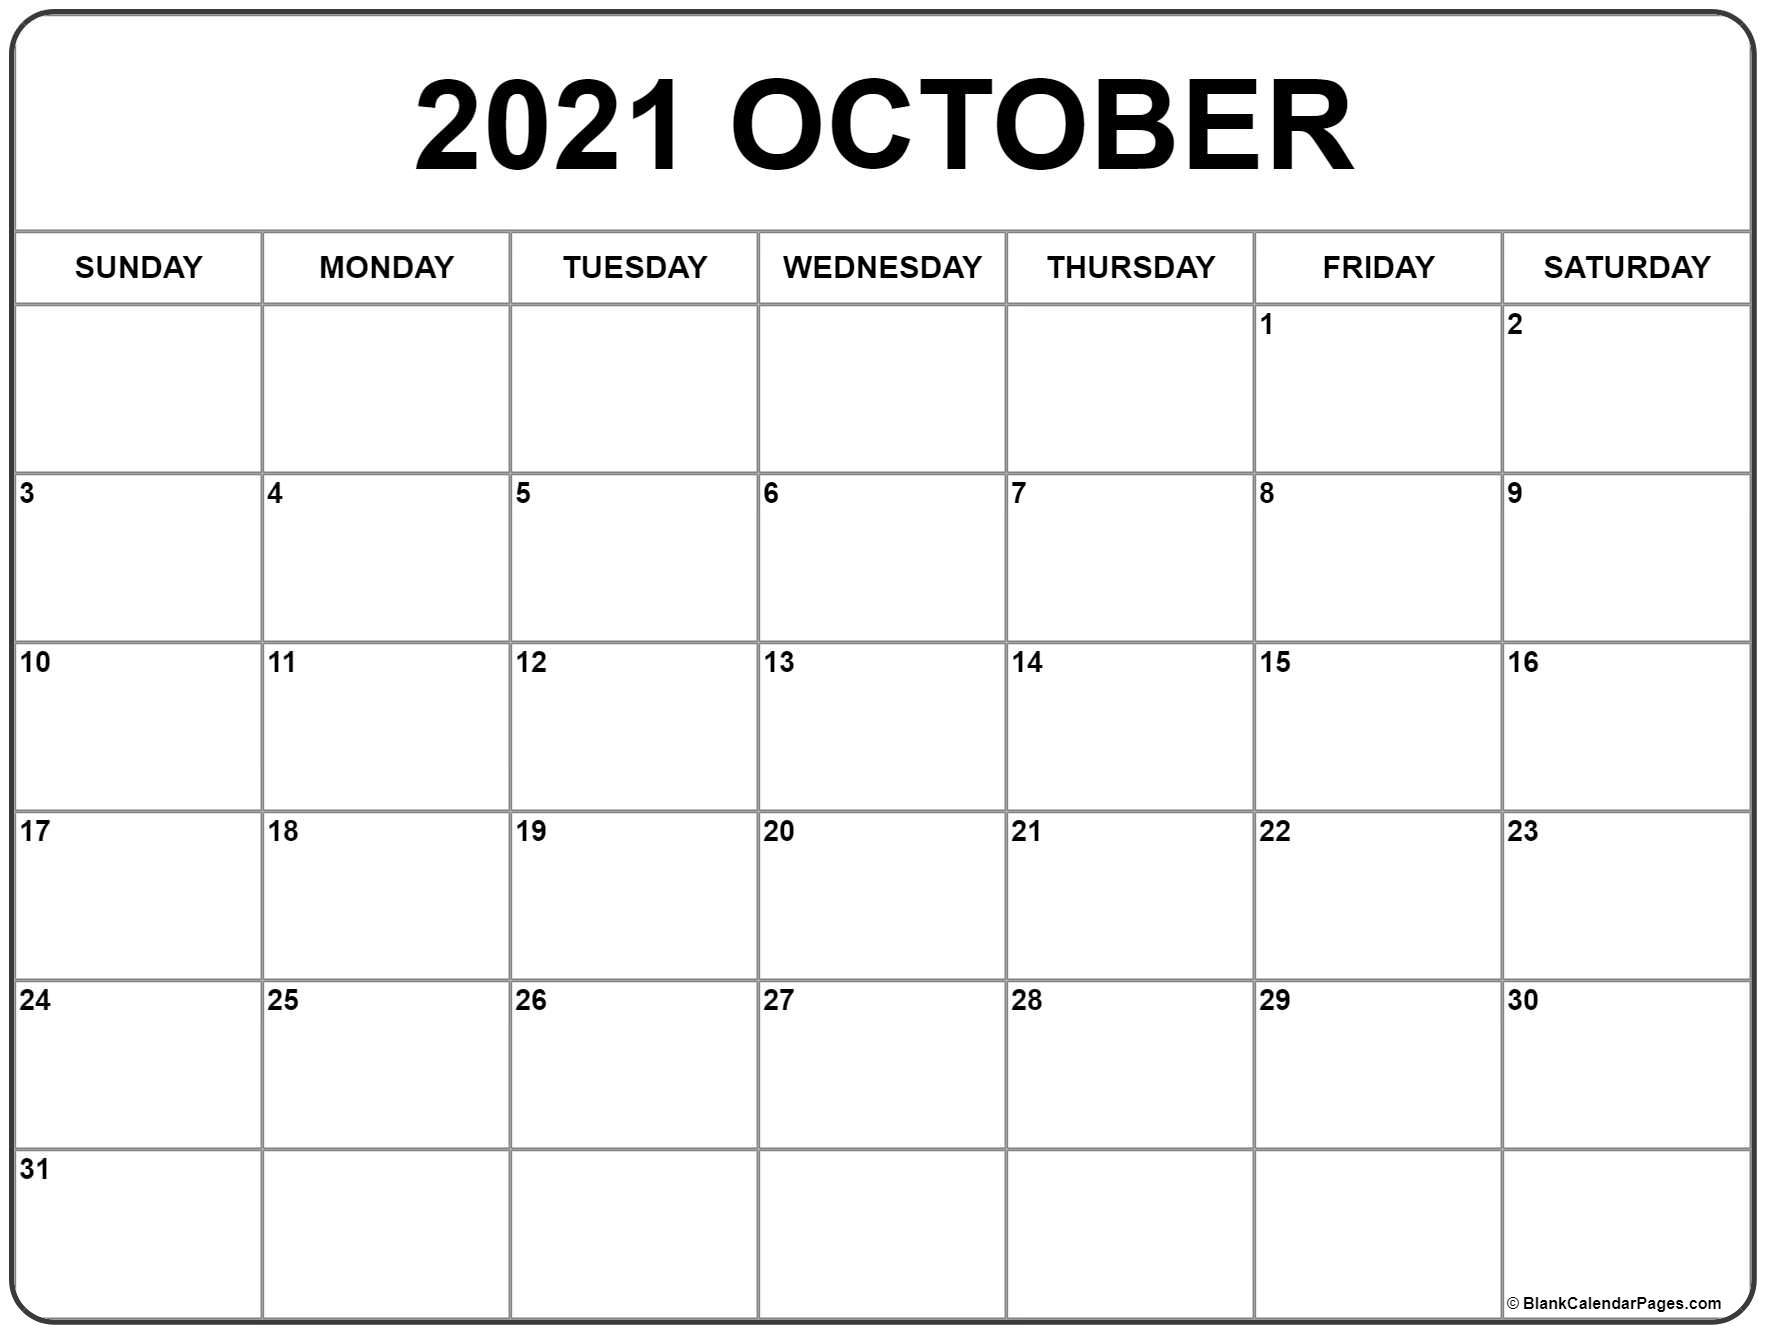 Get Free Printable October 2021 Calendar